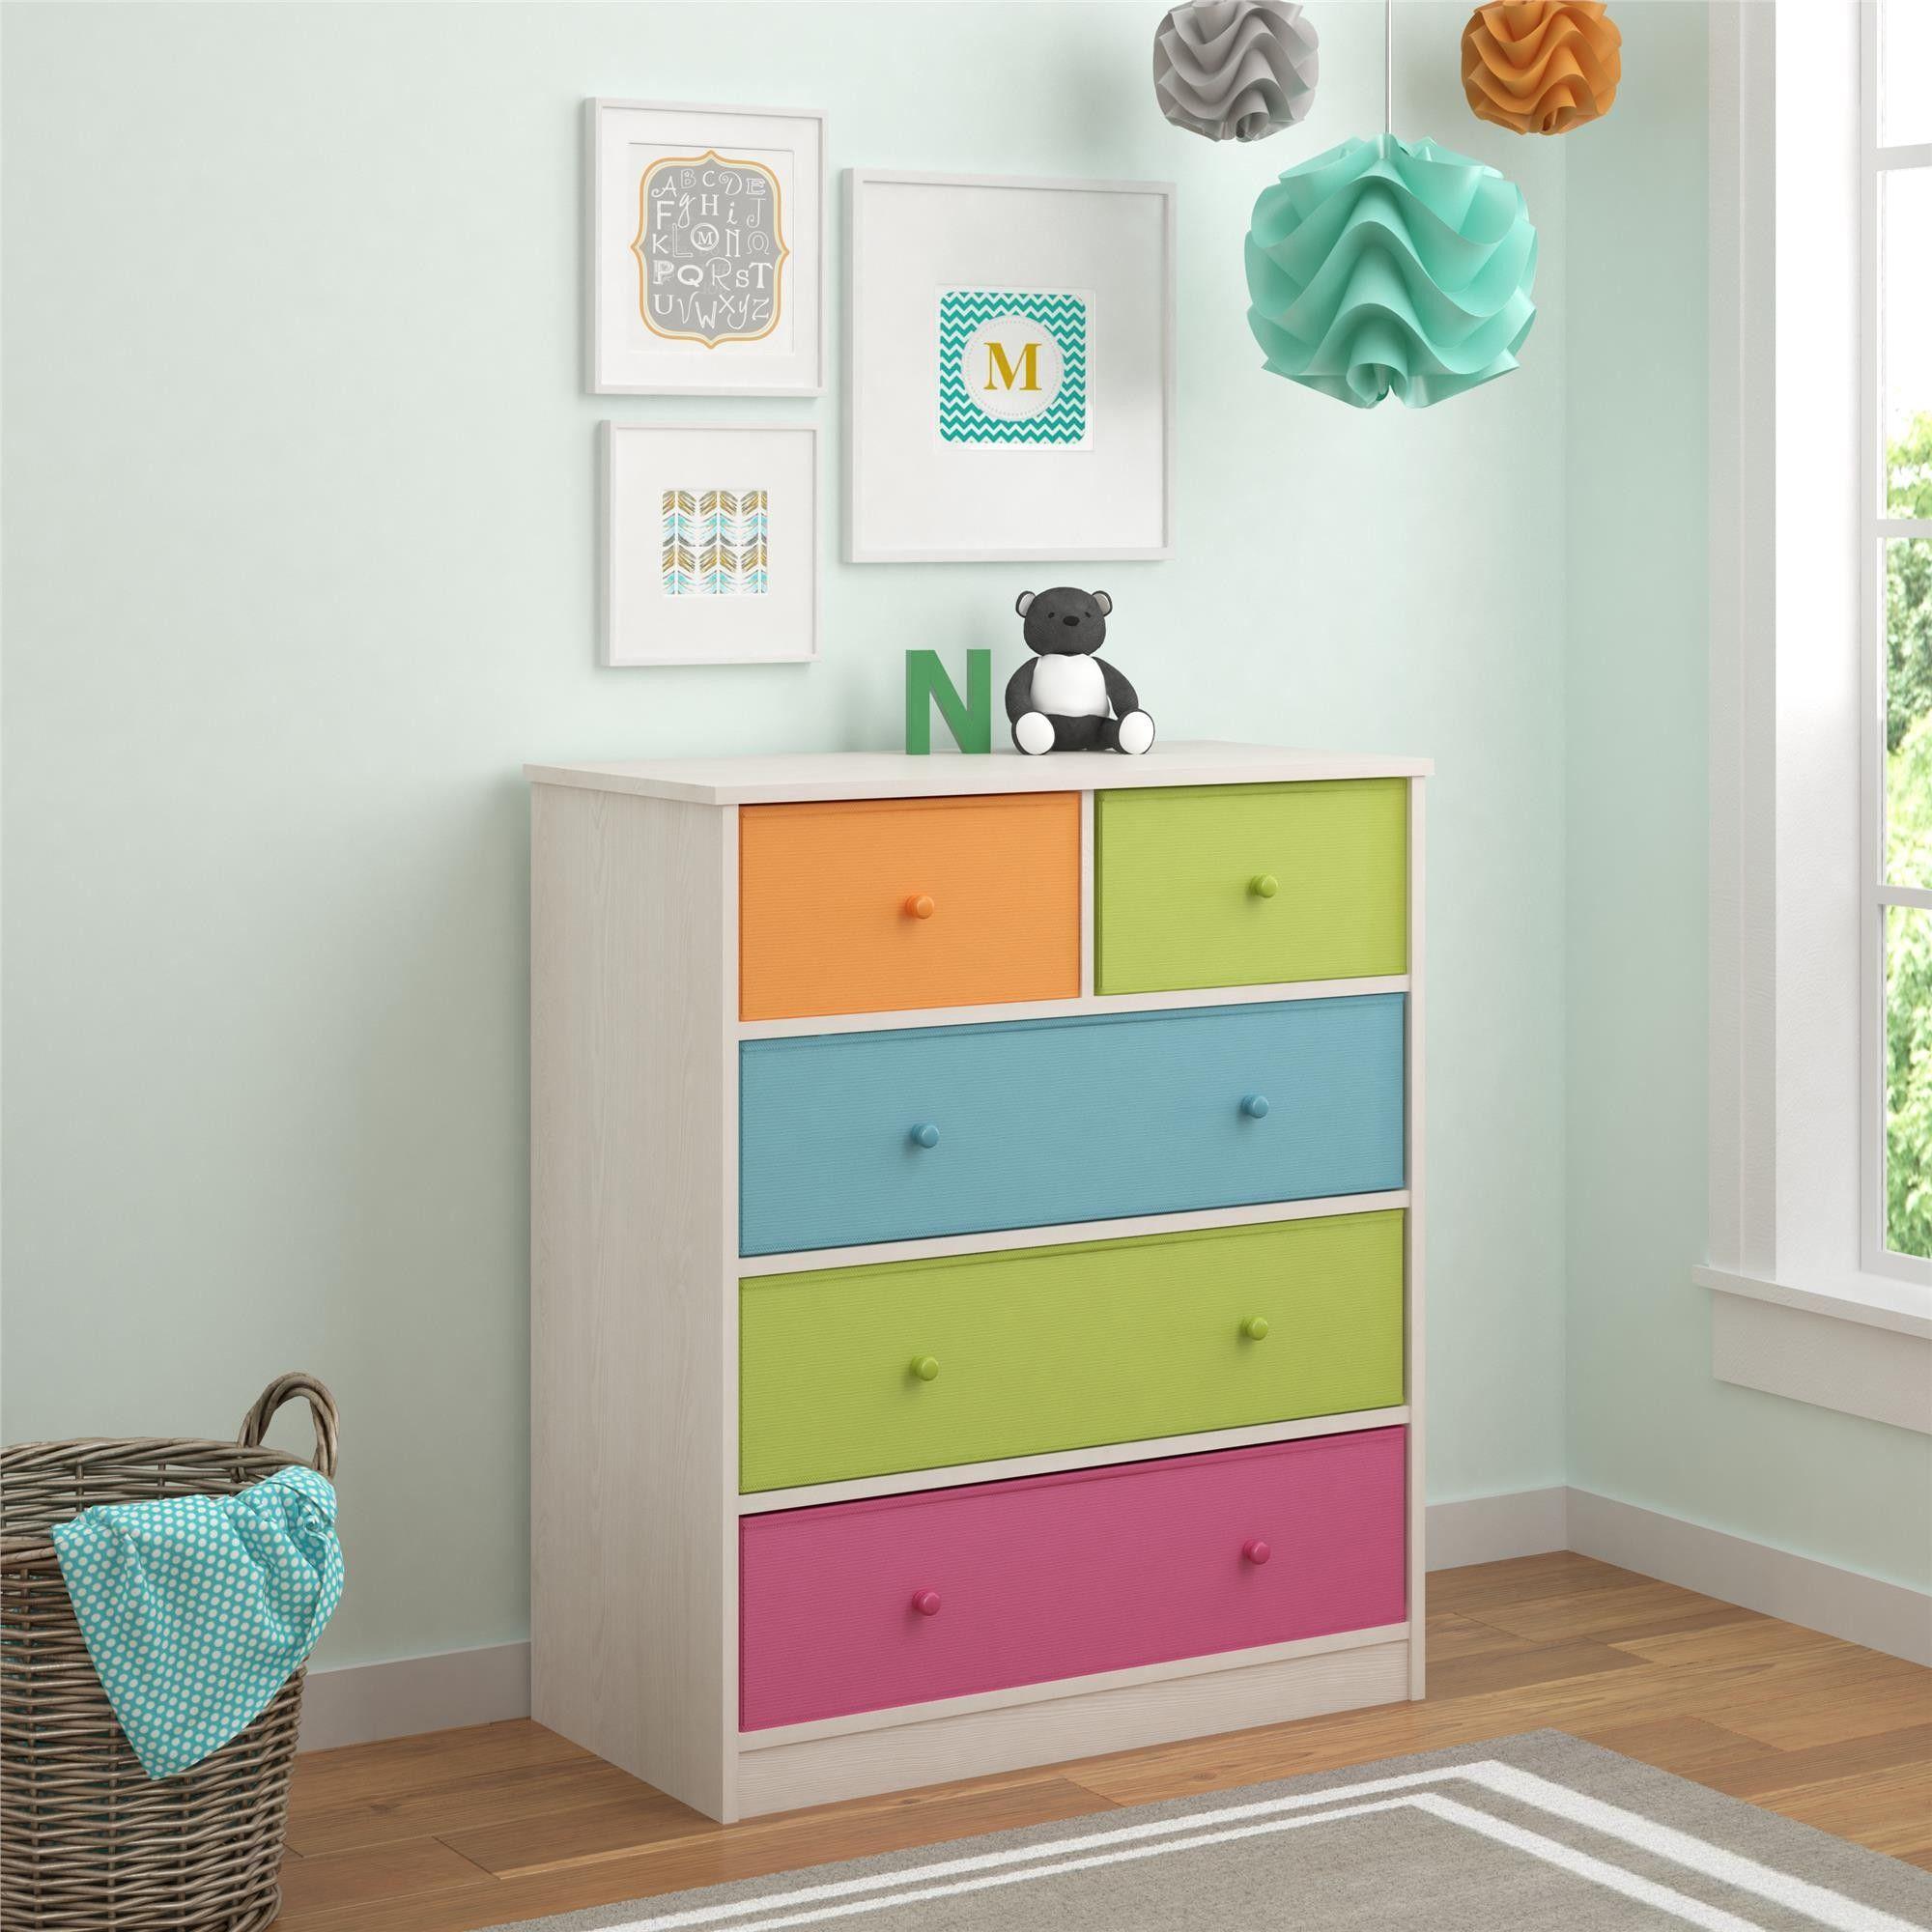 Brooke 5 Drawer Chest Kids Dressers Colorful Dresser Furniture Clearance